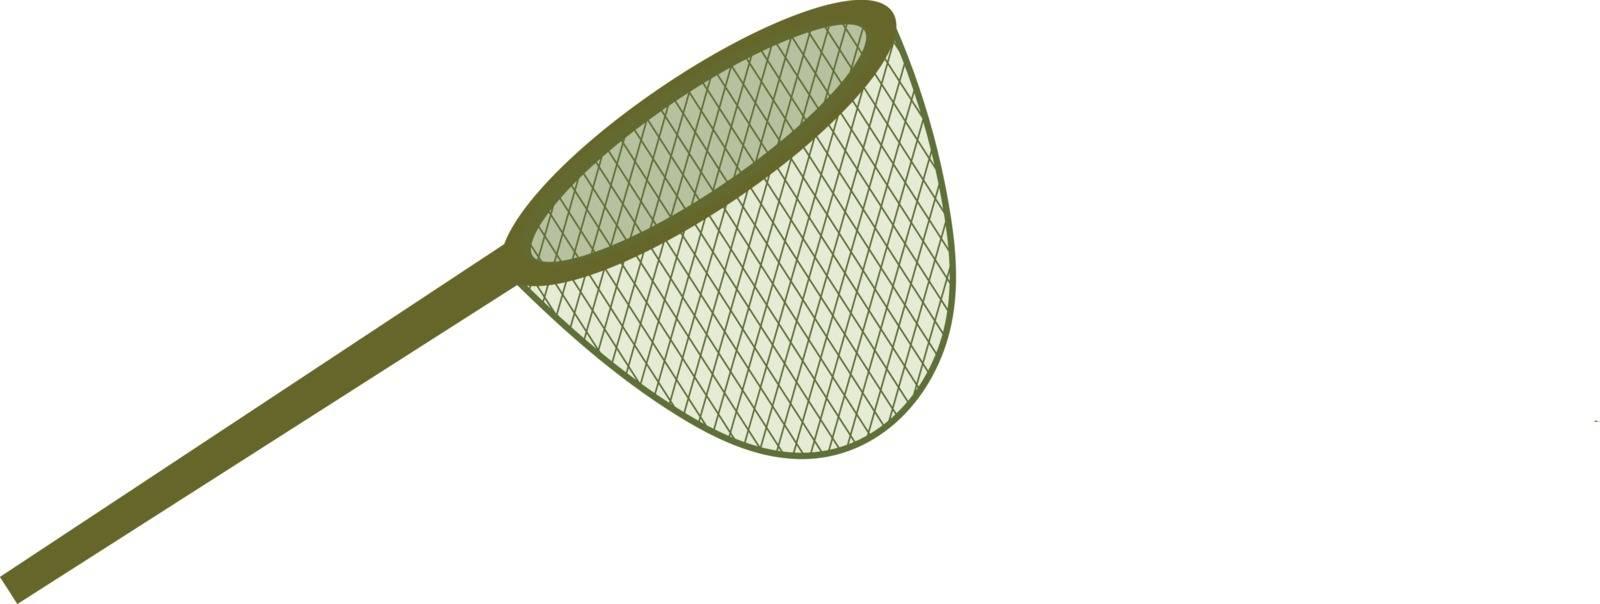 Fishing net. icon flat, cartoon style. Isolated on white background. Vector illustration, clip-art